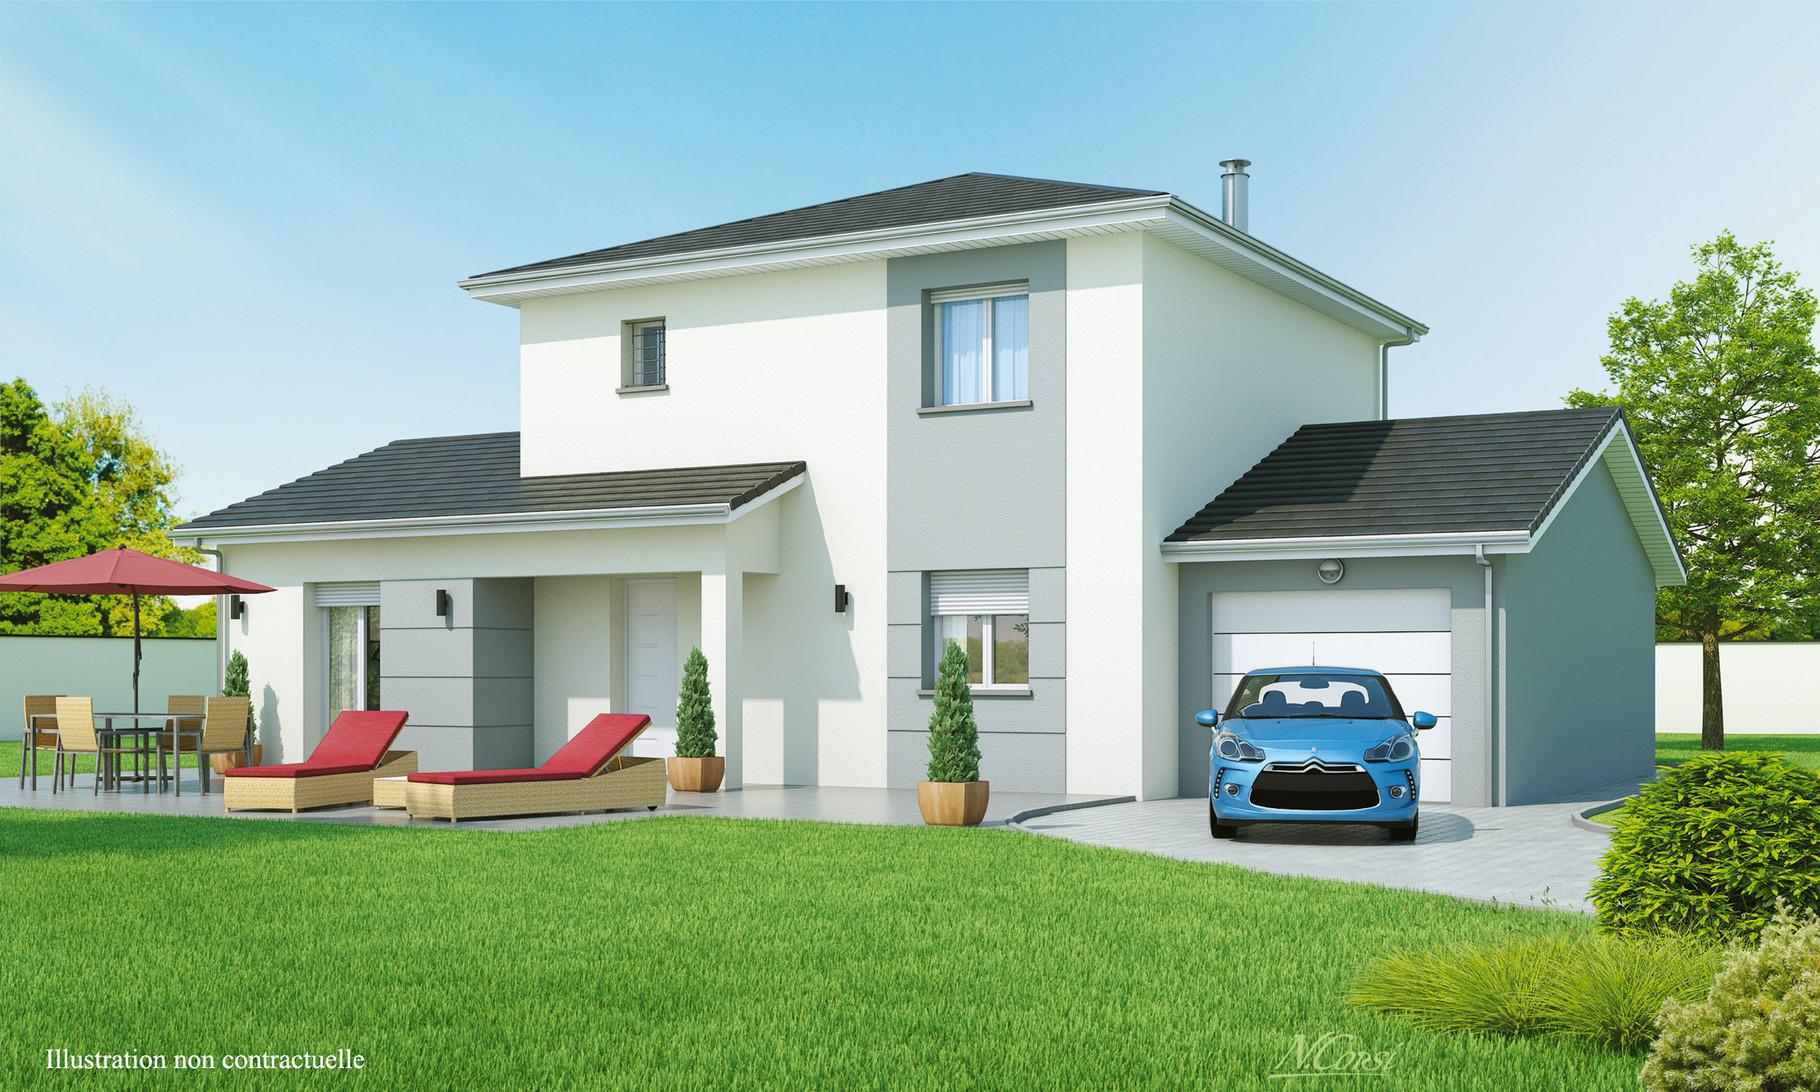 mod le matin clair maisons axial loire 42. Black Bedroom Furniture Sets. Home Design Ideas